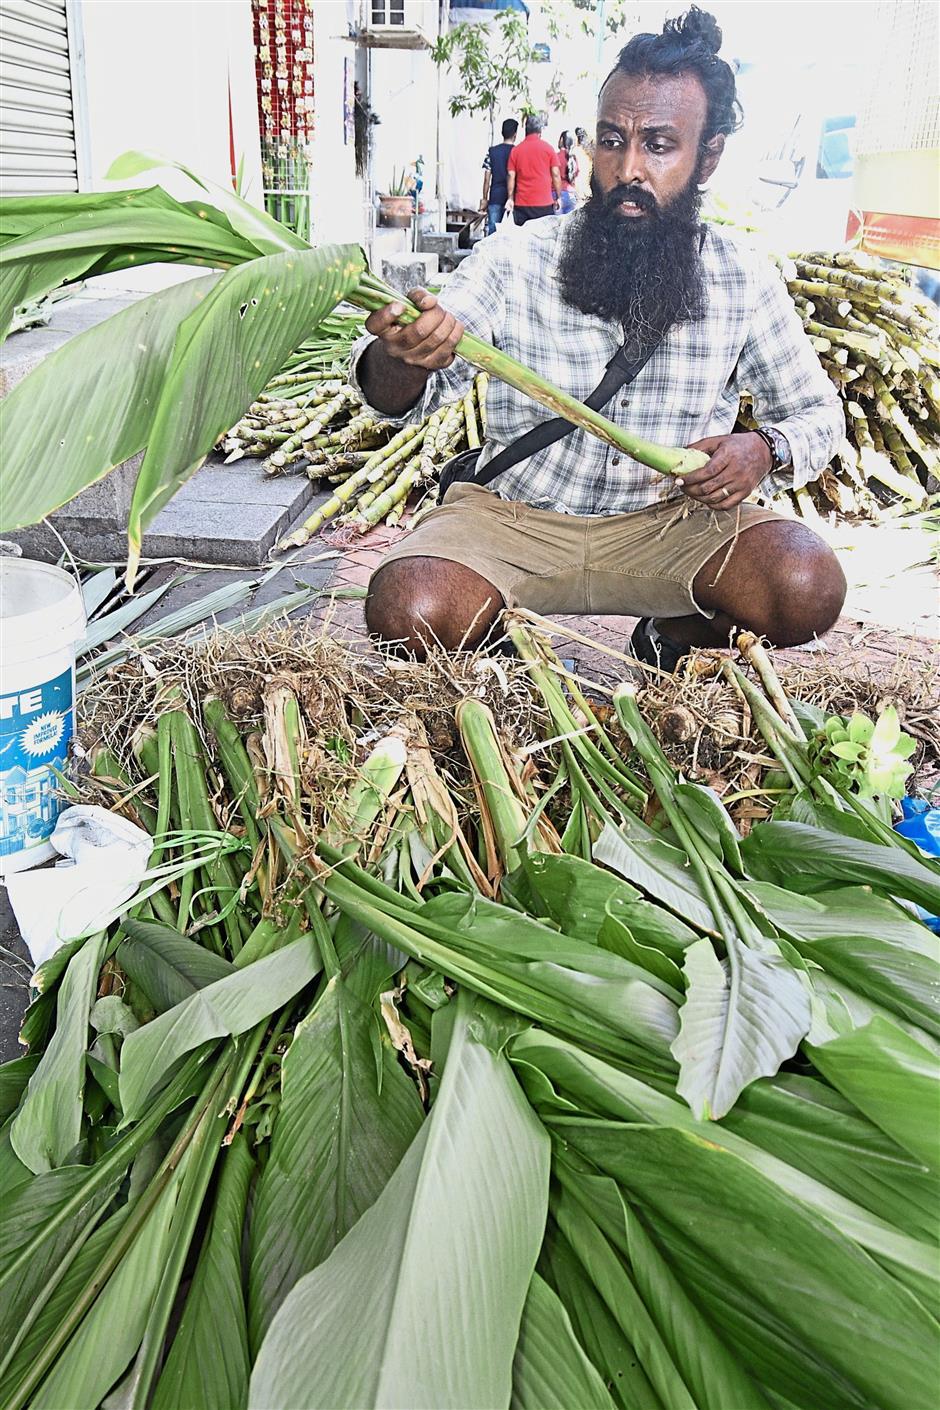 Anbukarasan Morotar preparing turmeric leaves in Little India while K. Rajathi (below) ties flower garlands at a shop along Jalan Mesjid Kapitan Keling. —Photos: CHAN BOON KAI, LIM BENG TATT/The Star and Bernama